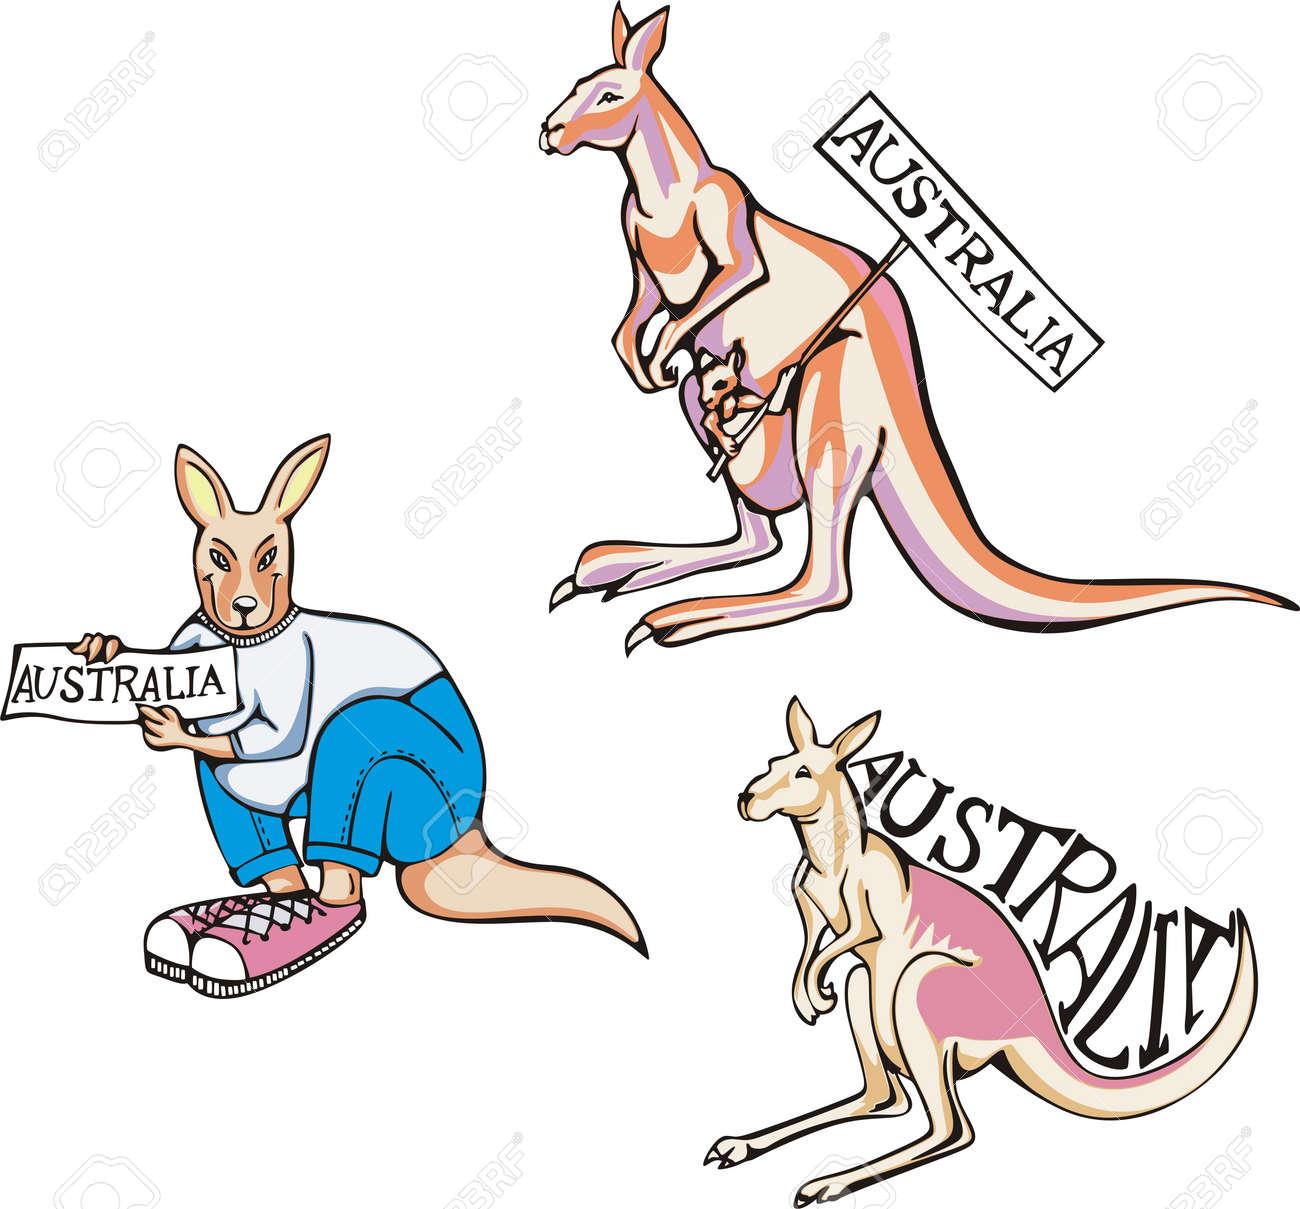 Australia - kangaroos. Set of color vector illustrations. Stock Vector - 16331239